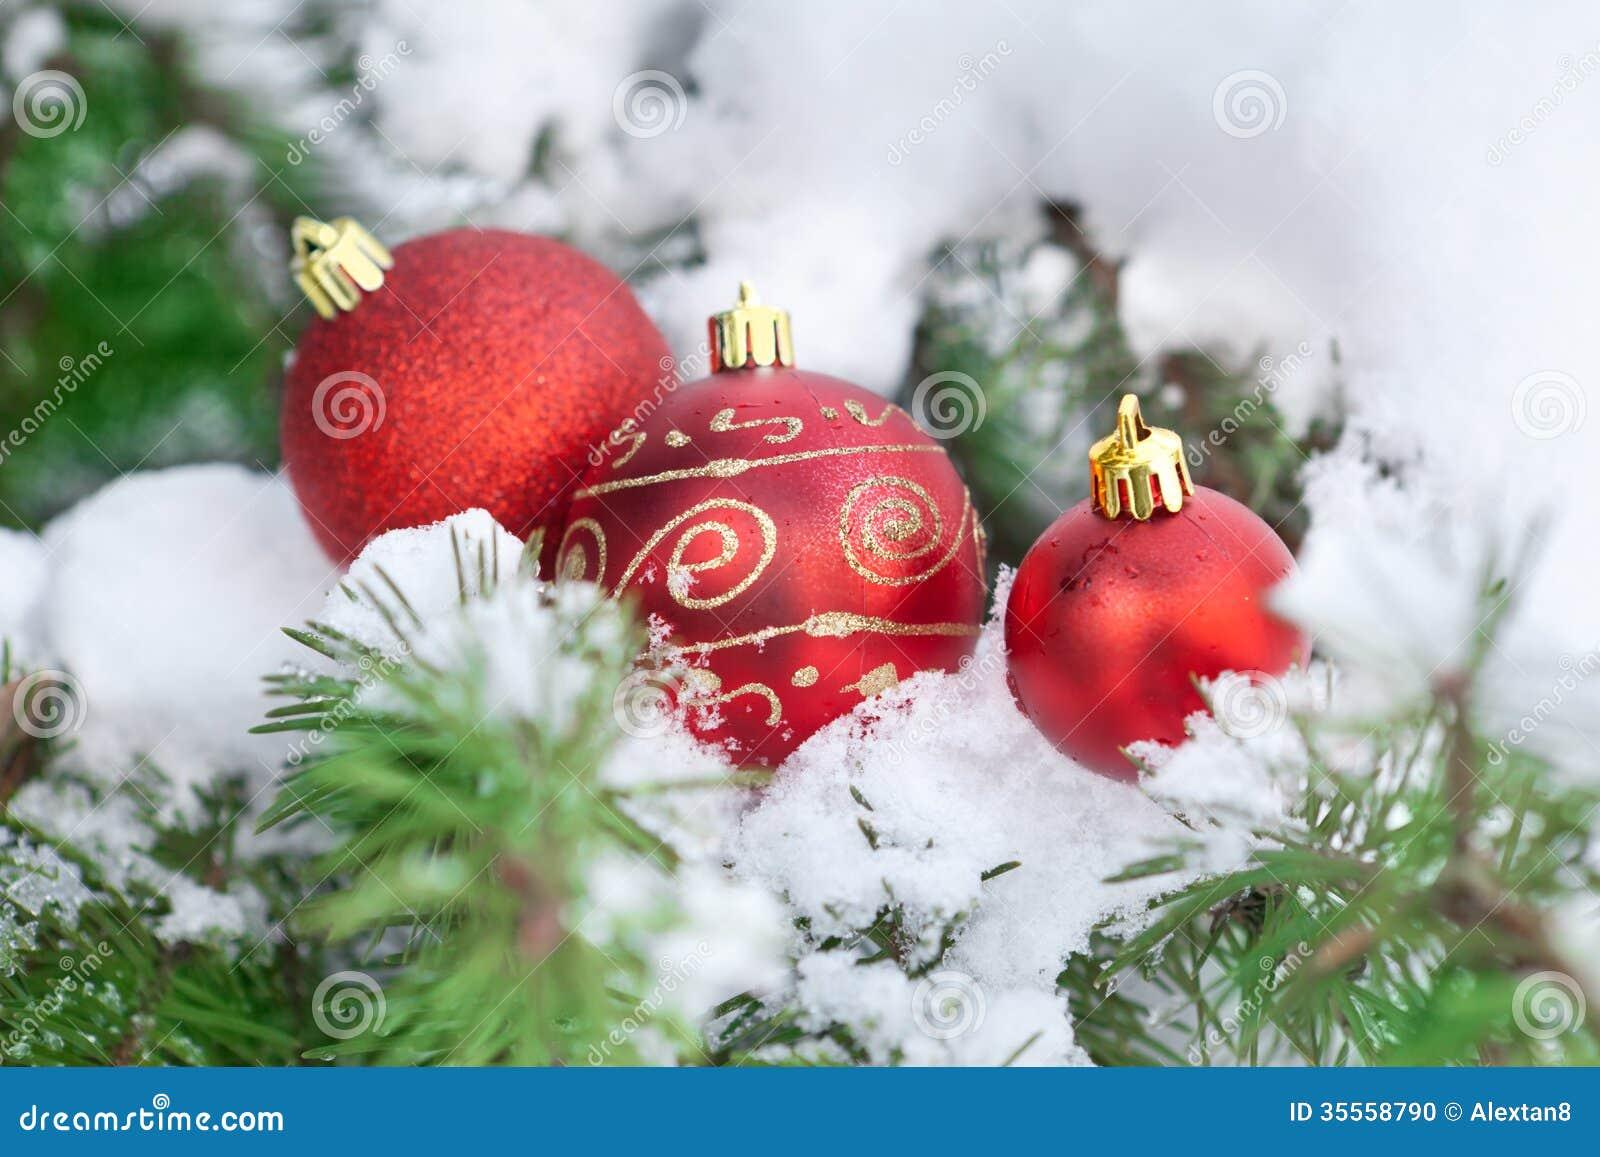 Christamas background decor ball on snow